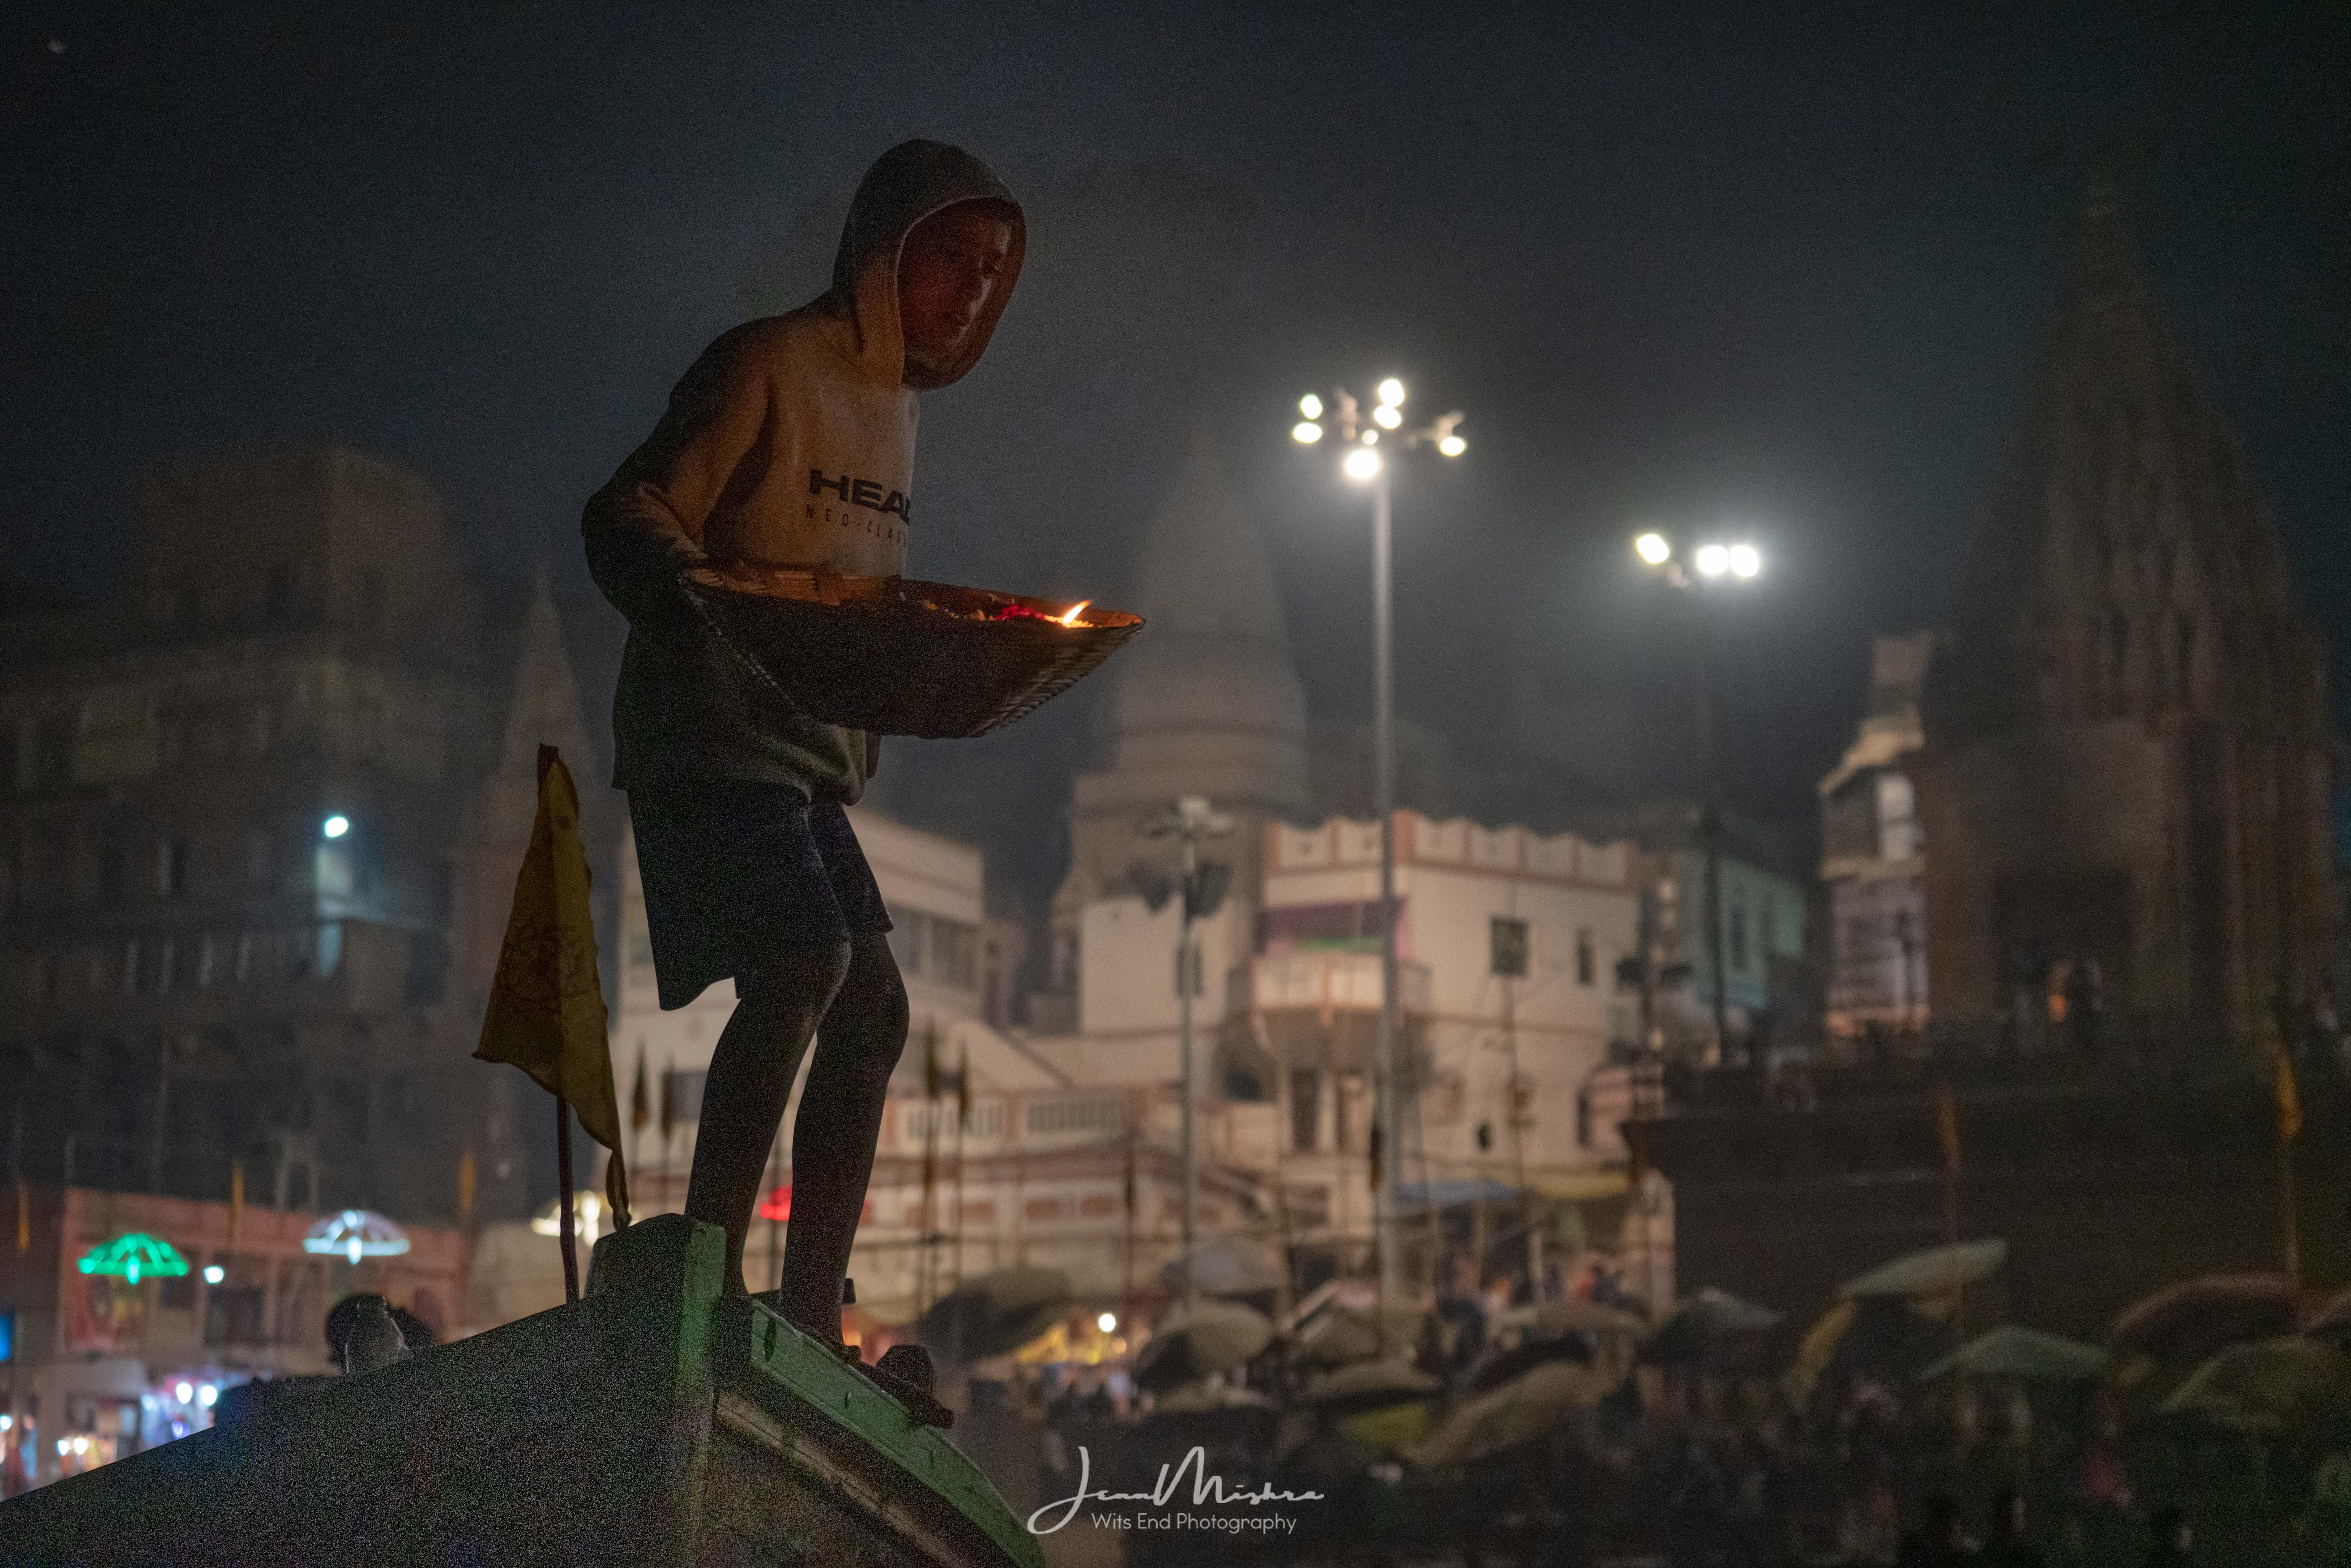 Selling offerings Ganga Aarti ceremony Dashashwamedh Ghat in Varanasi India